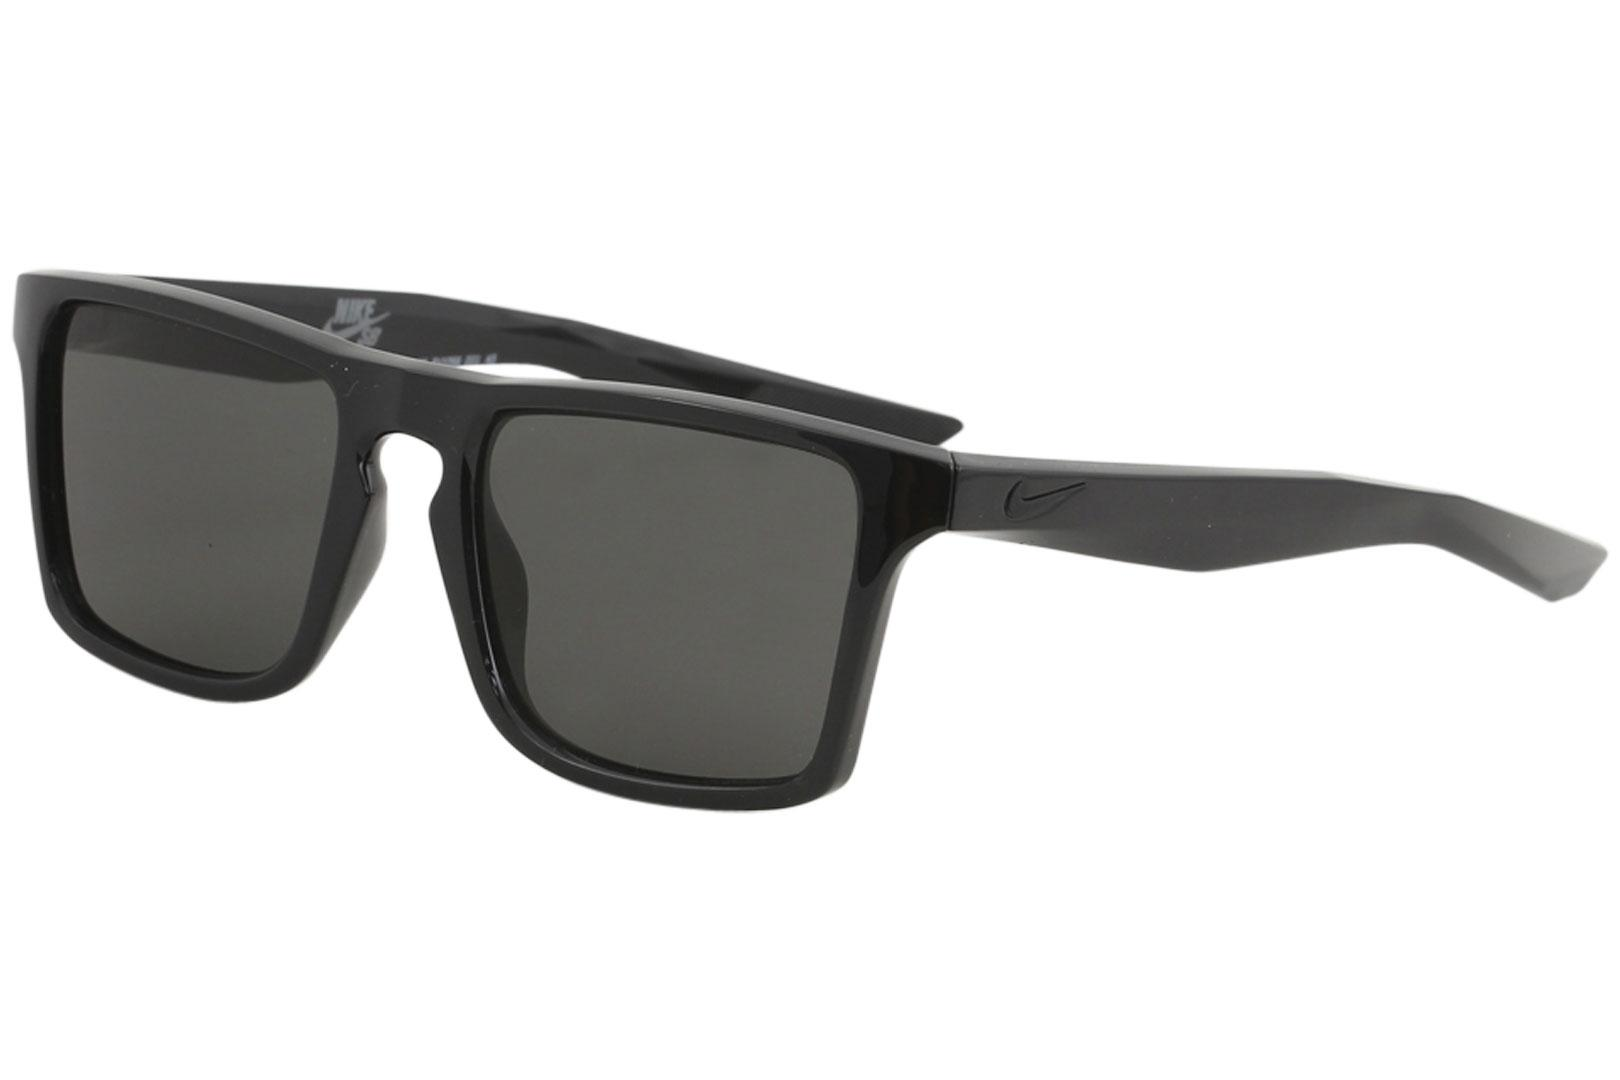 Image of Nike SB Men's Verge EV1059 EV/1059 Sport Square Sunglasses - Black/Dark Grey   001 - Lens 52 Bridge 19 Temple 145mm